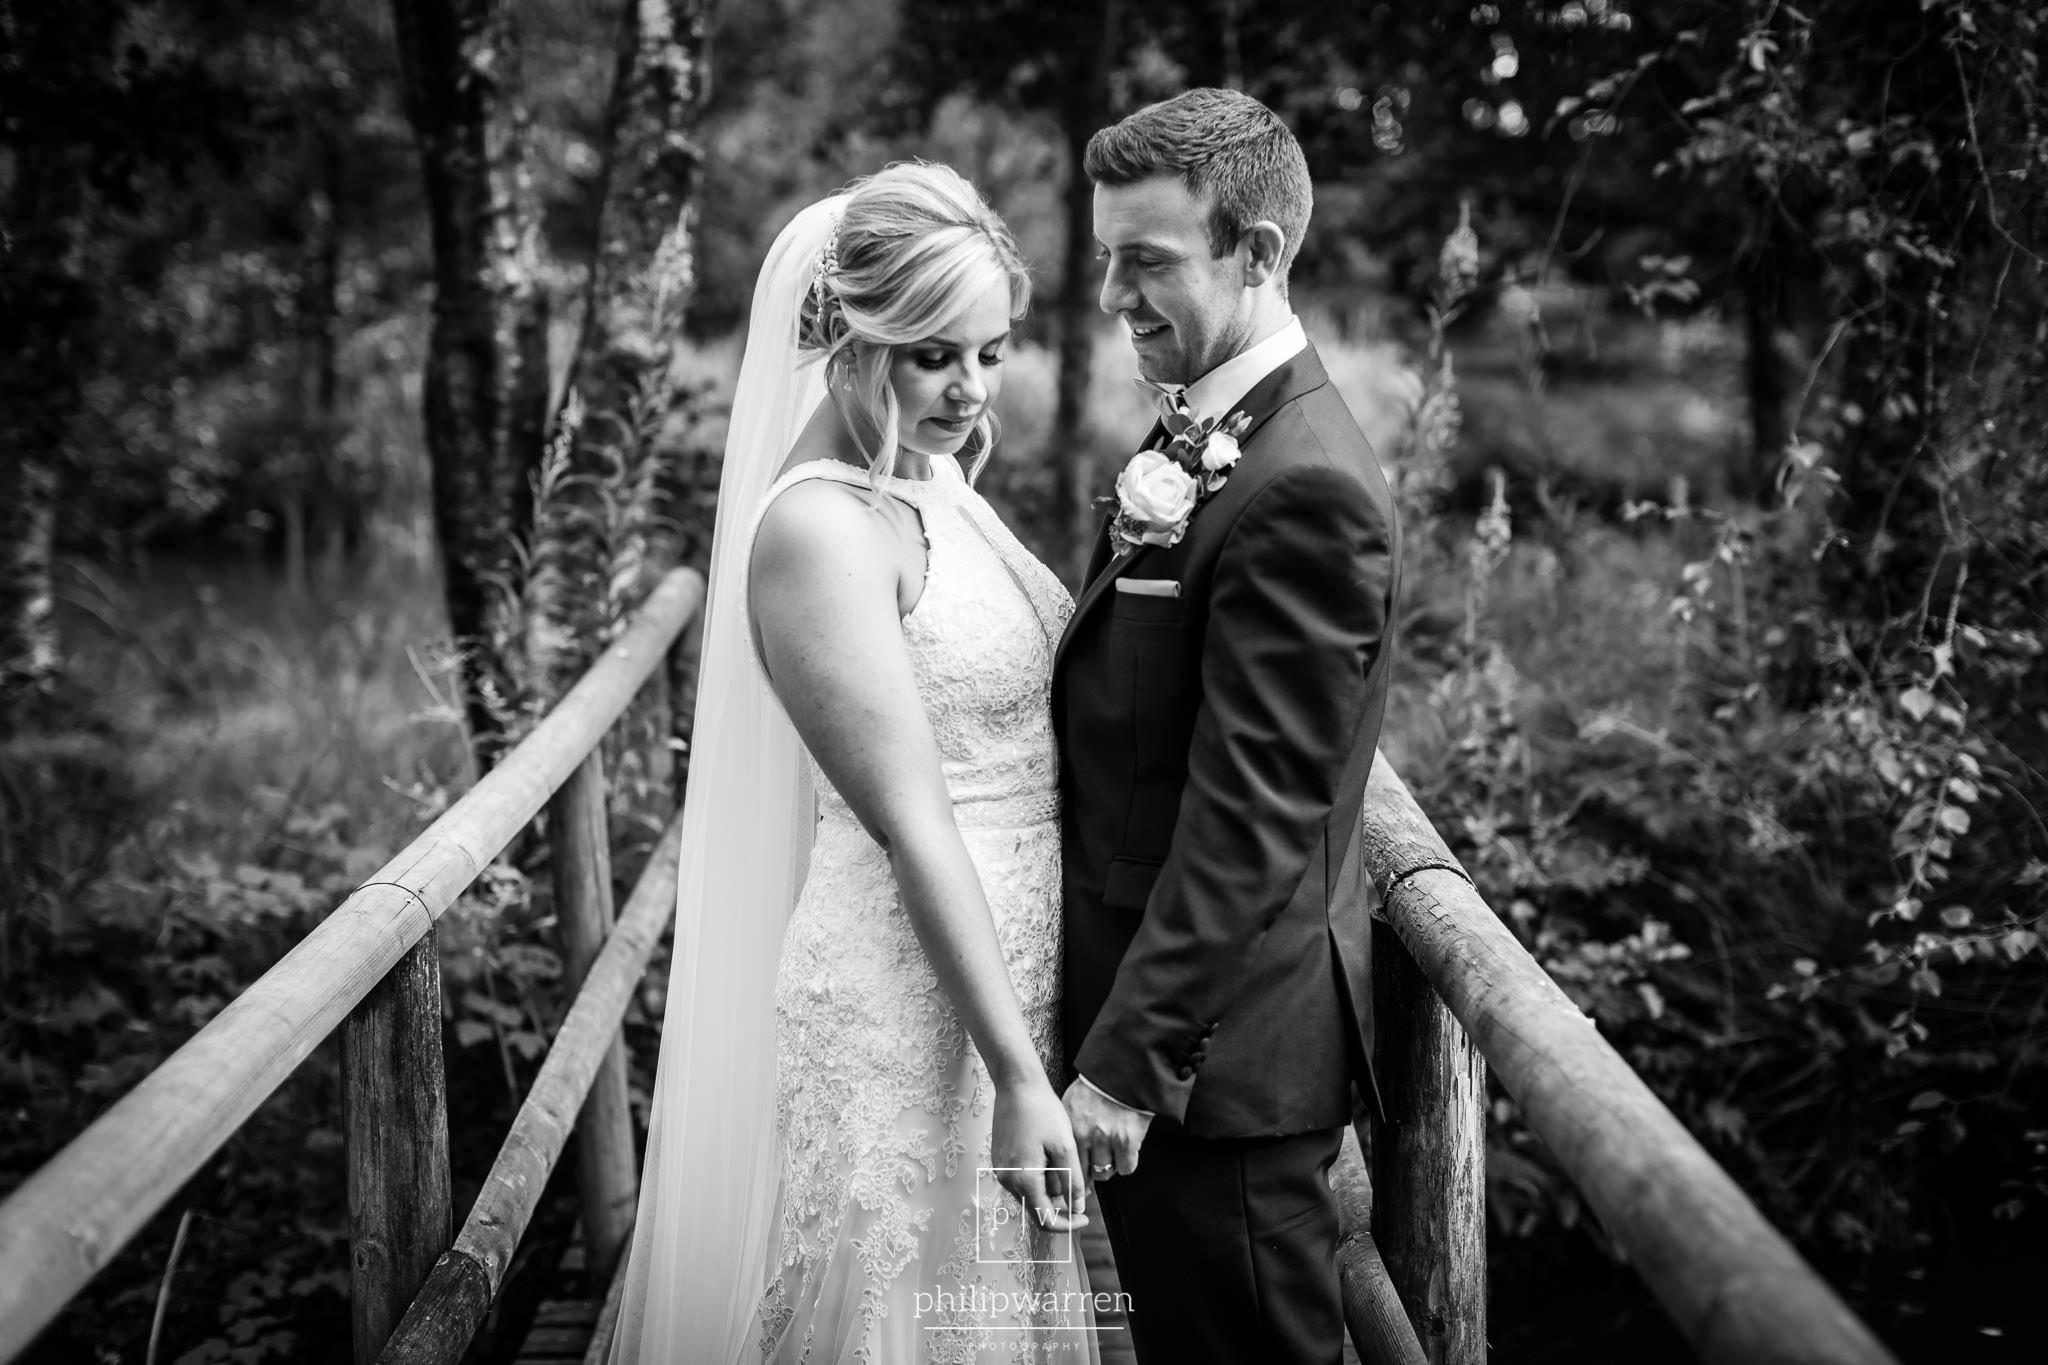 wedding photos at llanerch vineyard rachel + craig-8.jpg